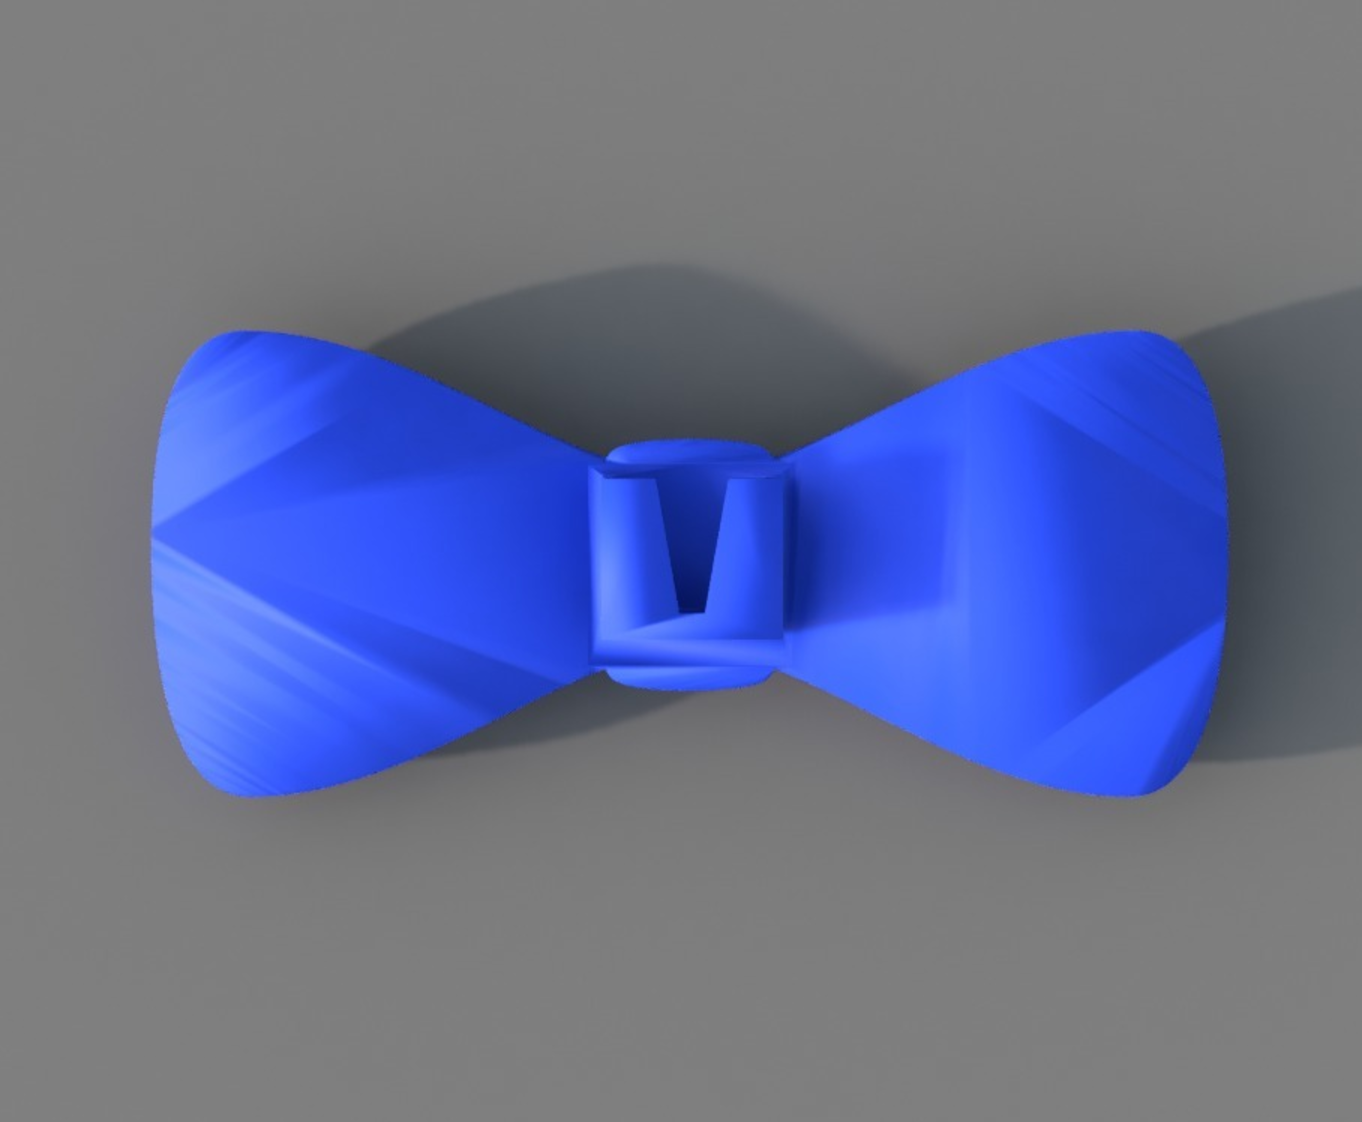 Capture d'écran 2017-06-20 à 10.07.34.png Download STL file Bowtie (clips on to button) • 3D printing model, 3DPrintingGurus